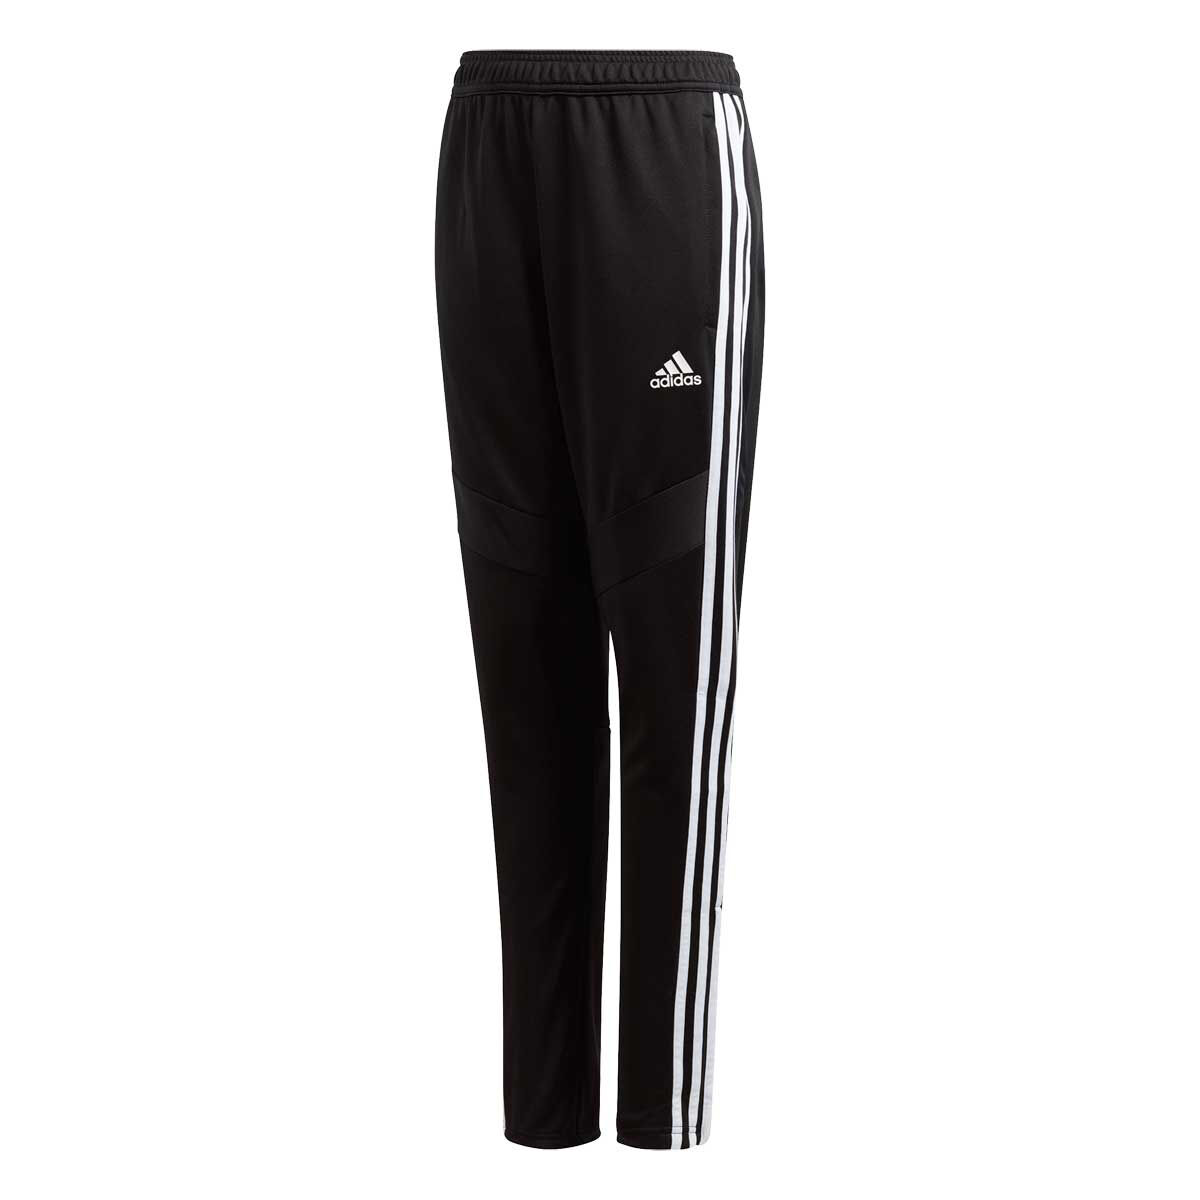 adidas Boys Tiro 19 Training Pants